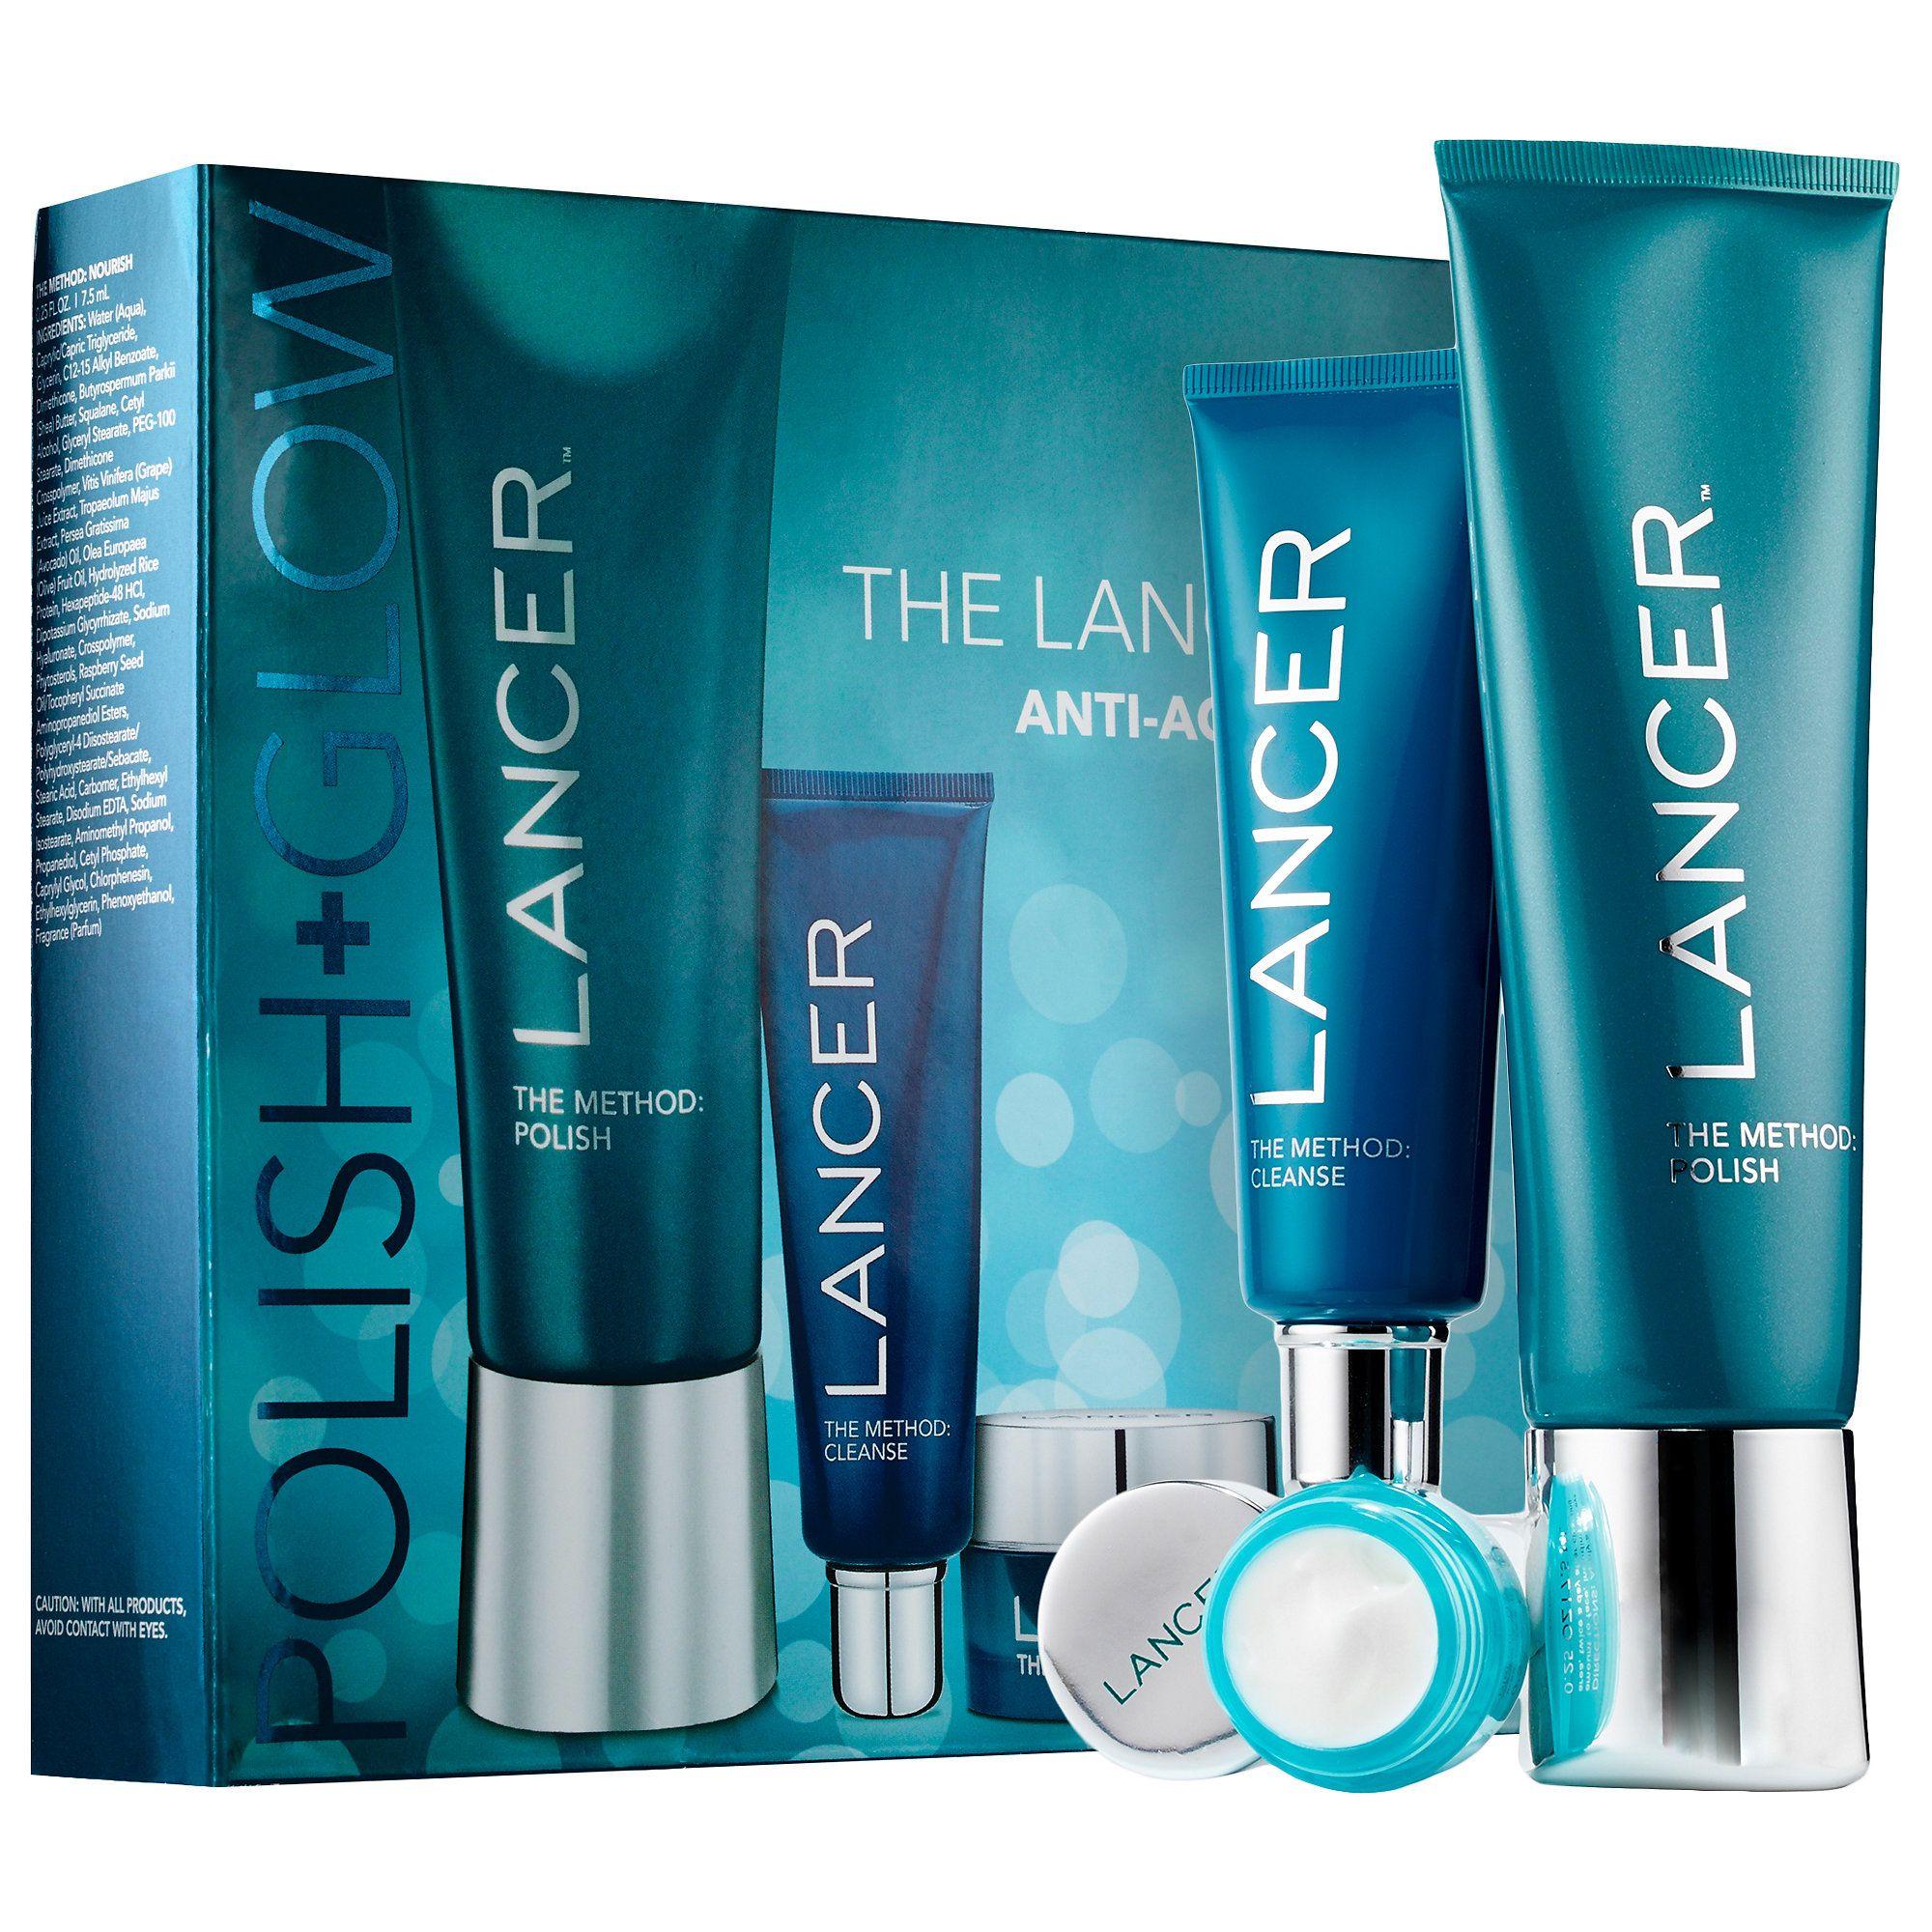 Sephora Lancer The Method Polish Glow Skin Care Sets Travel Value Lancer Skincare Sephora Hydrating Moisturizer